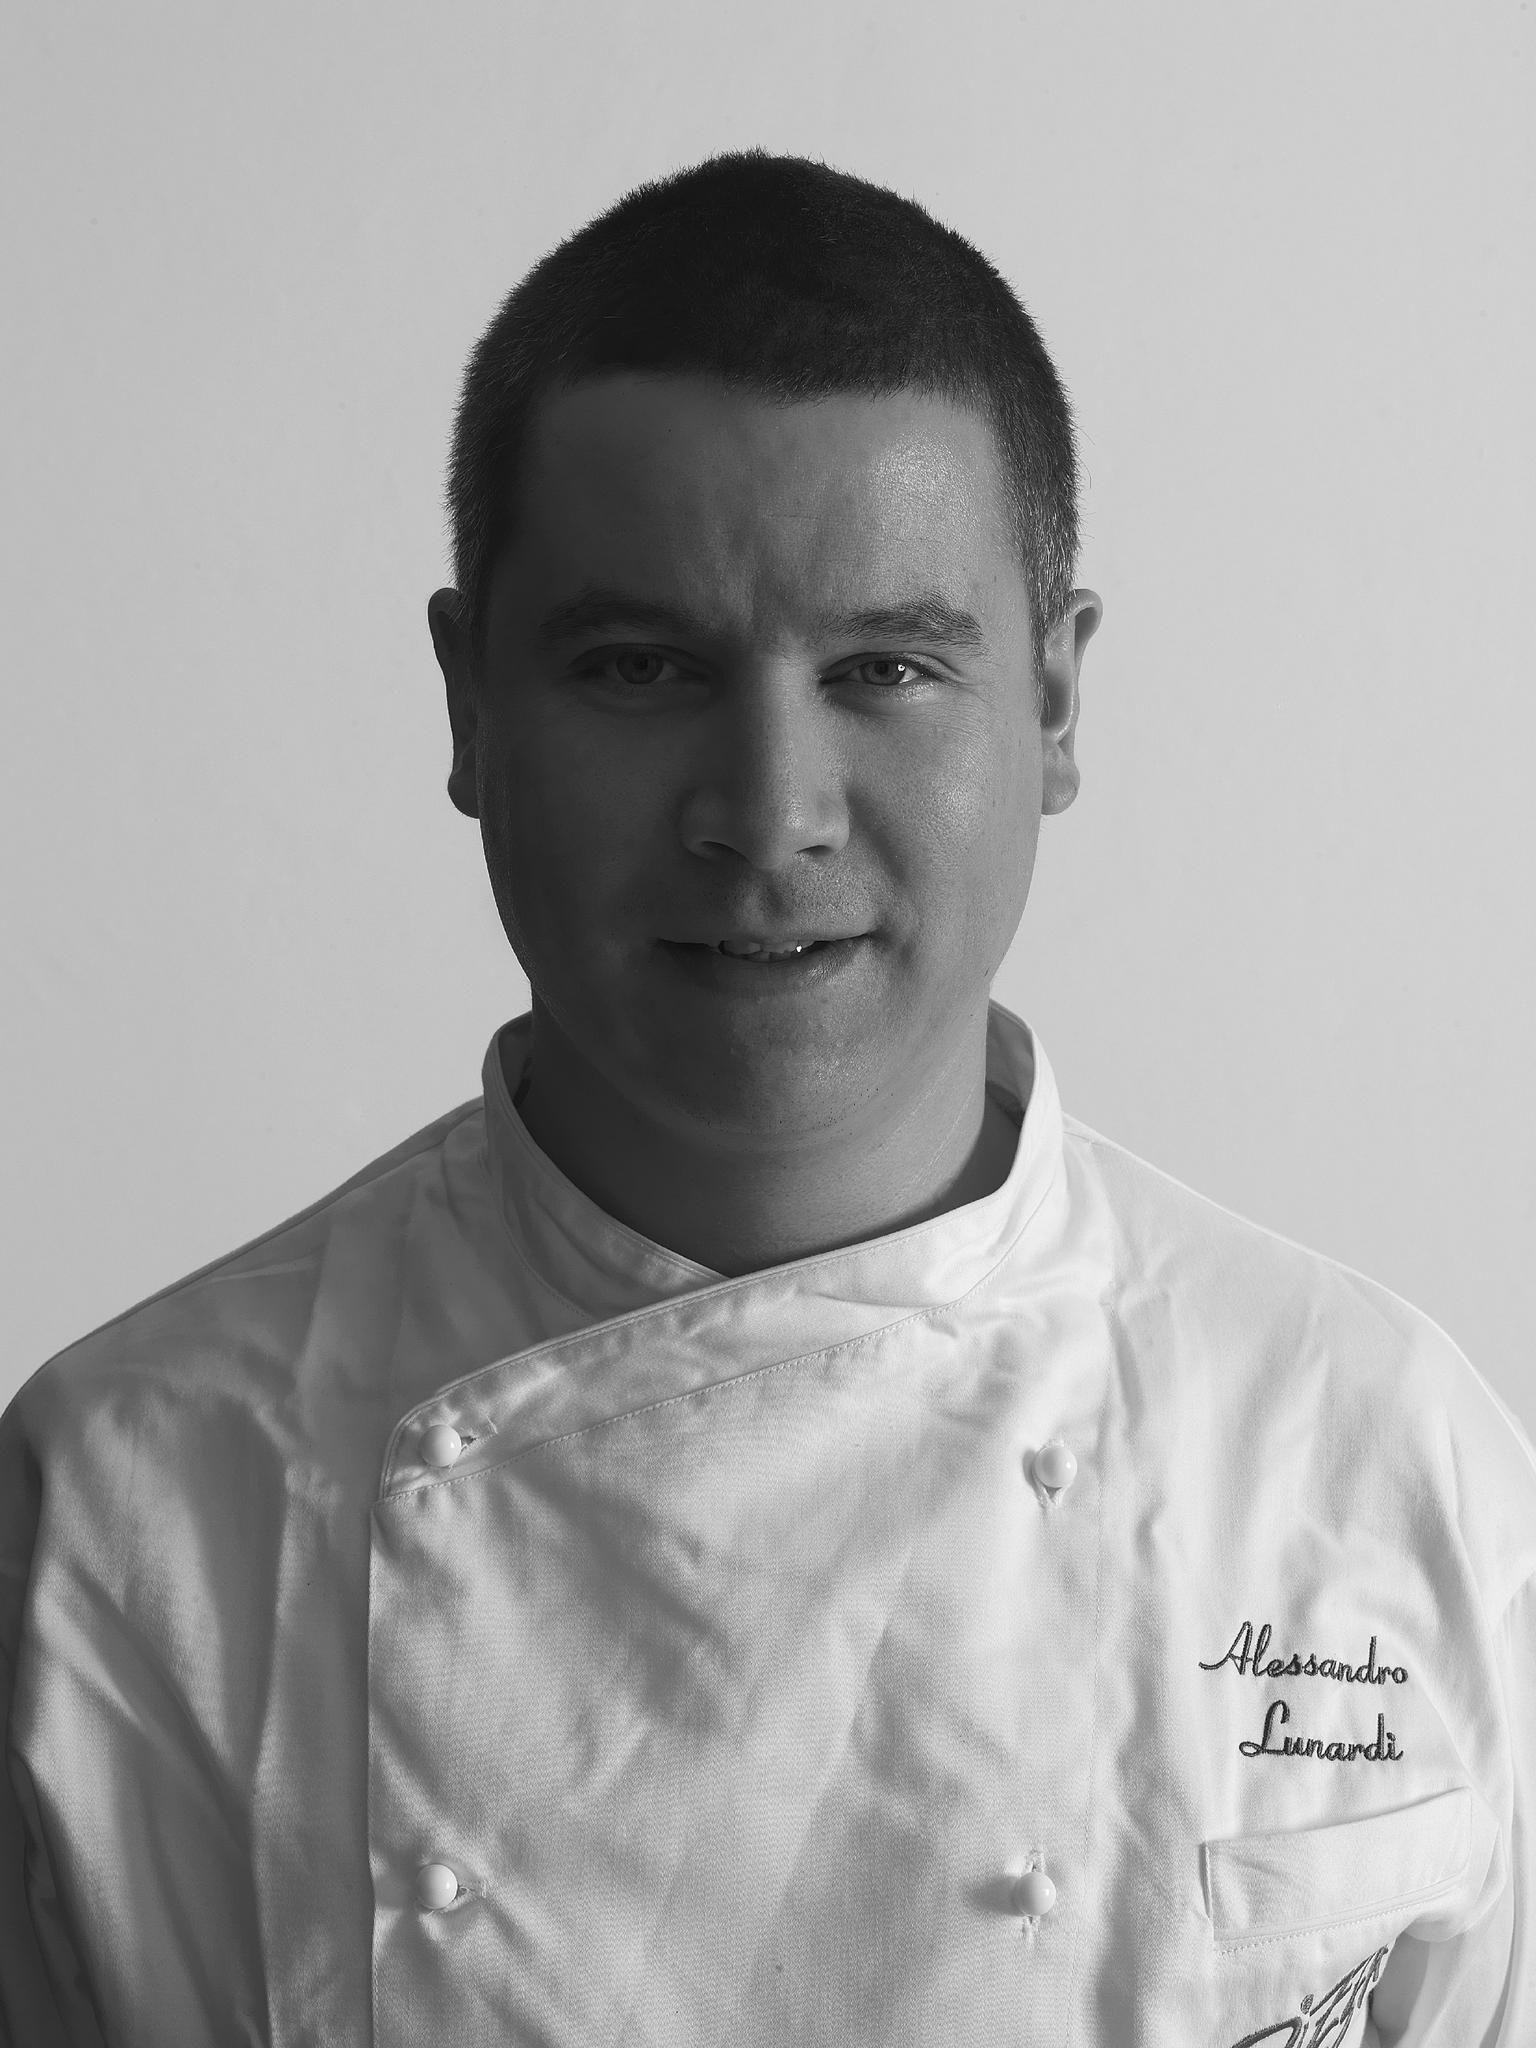 Alessandro Lunardi